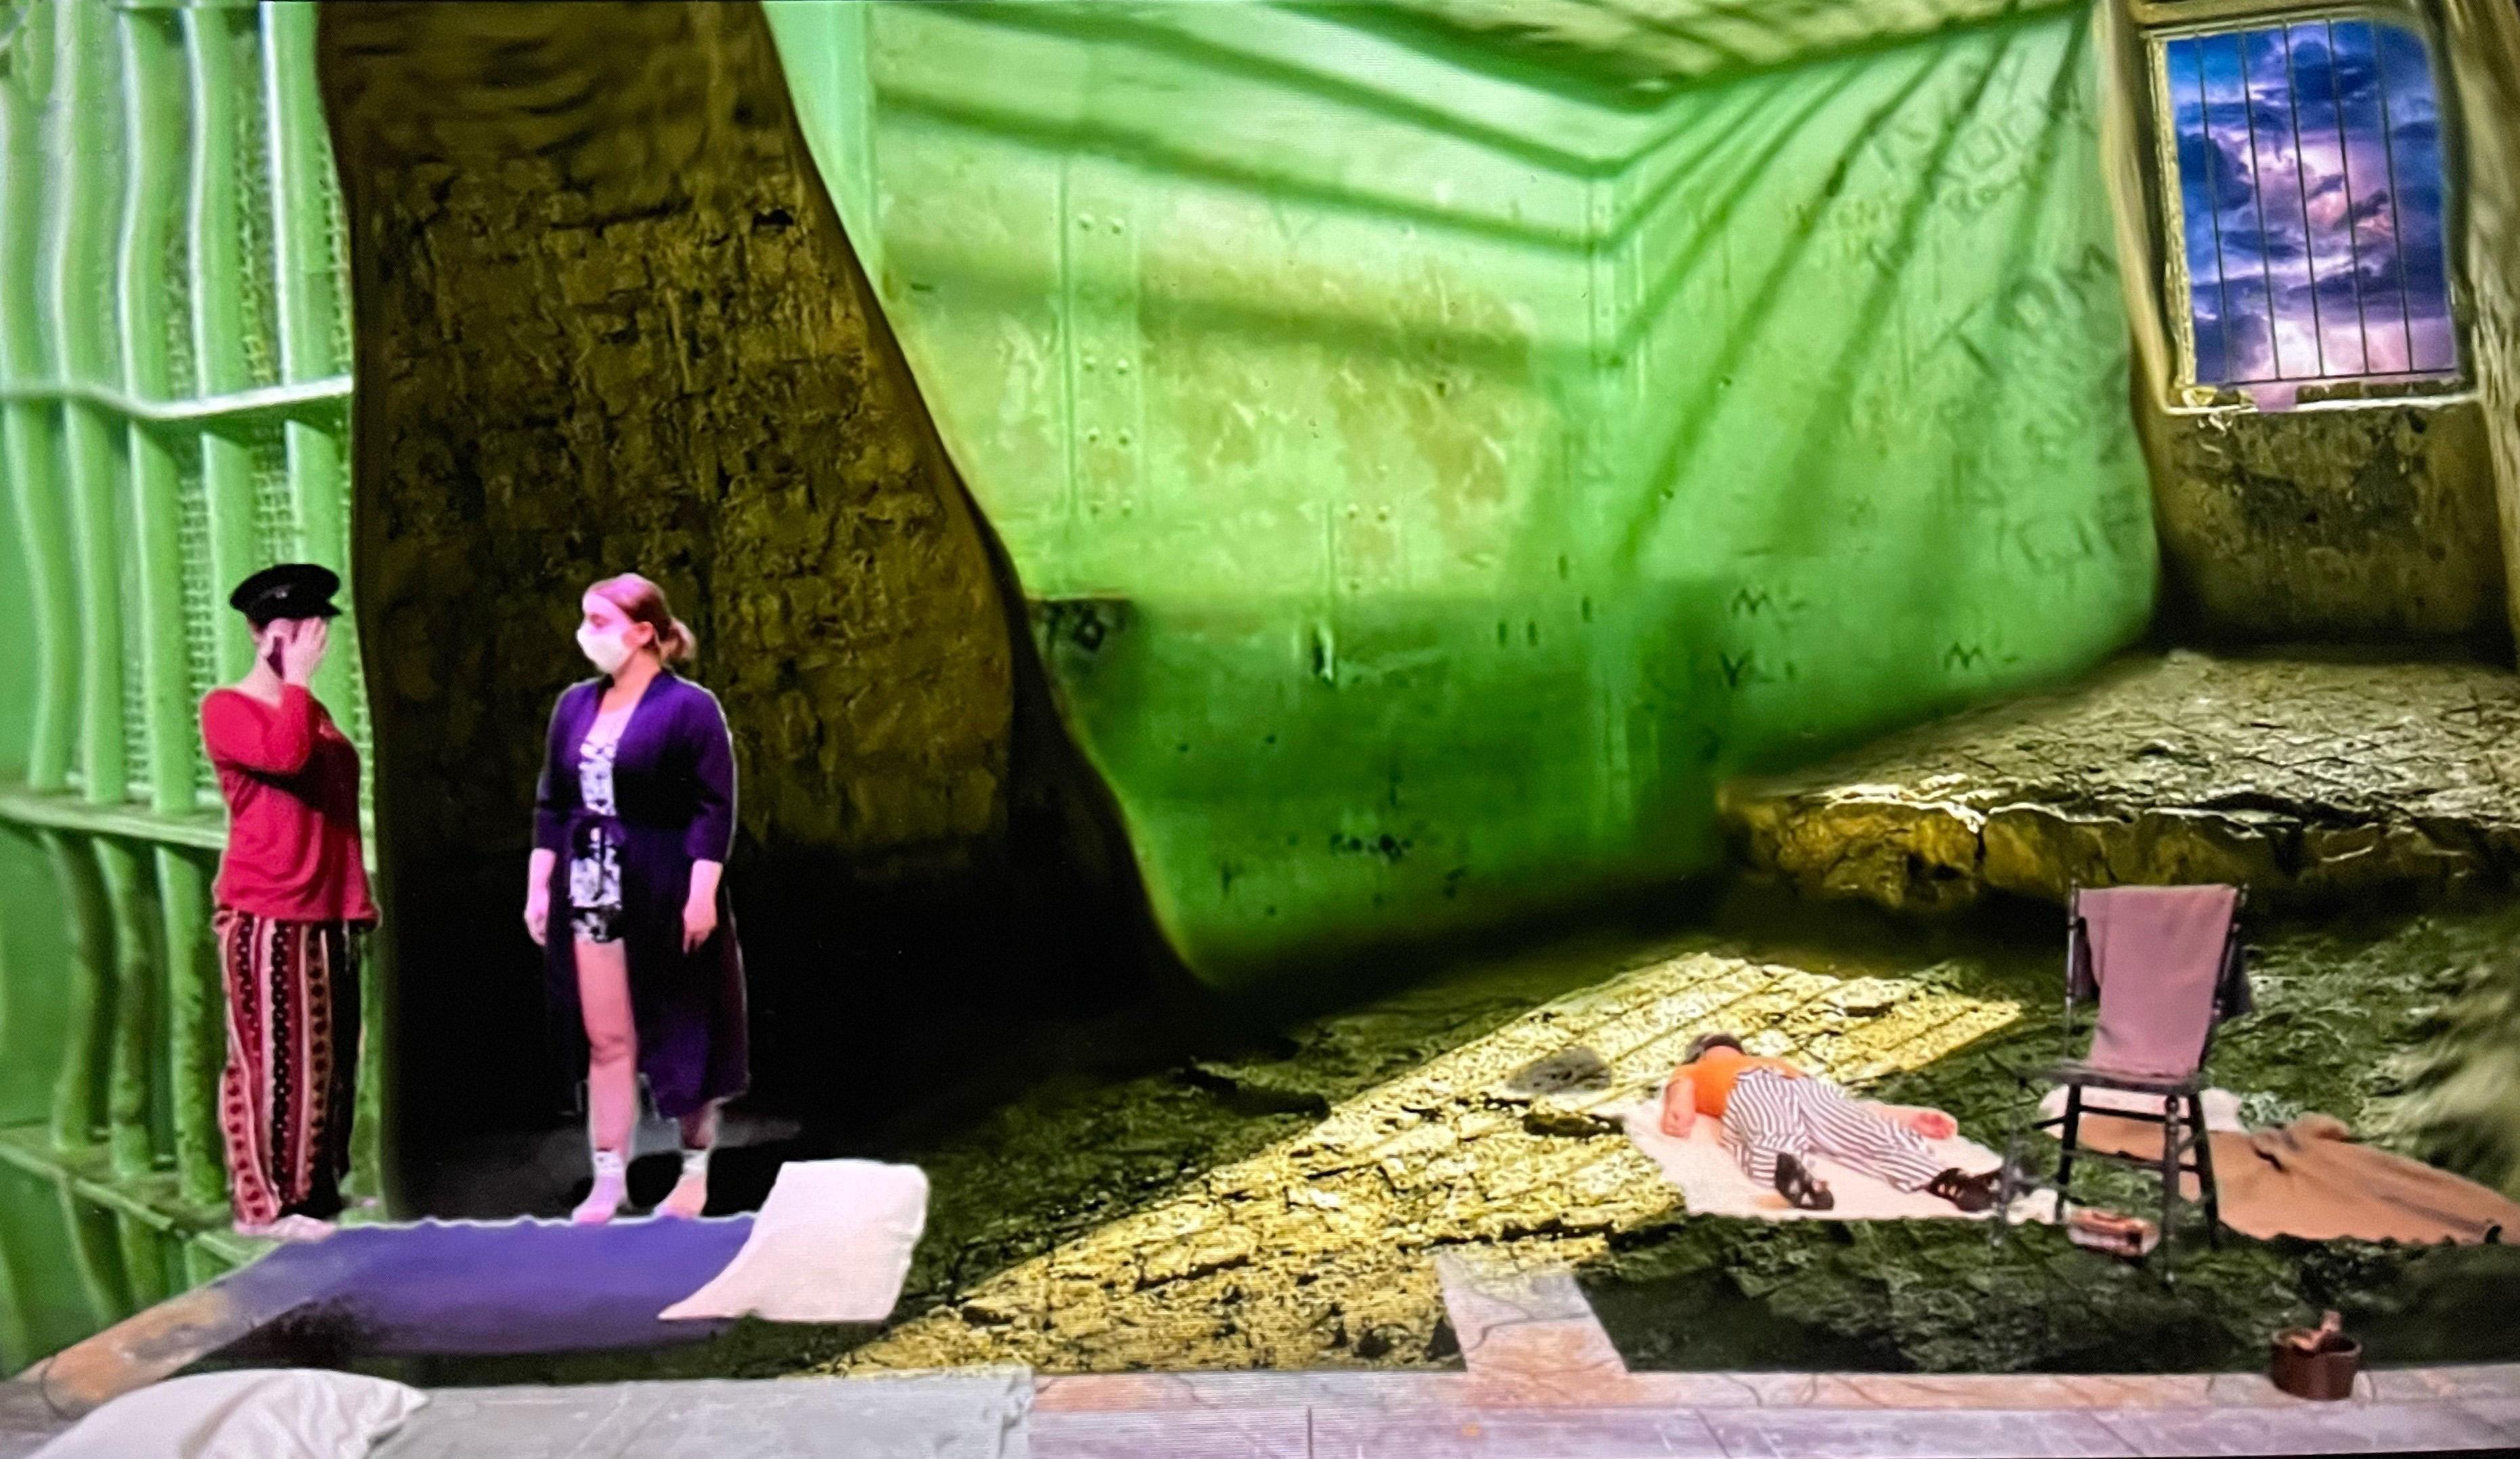 https://theatrefilm.ubc.ca/wp-content/uploads/sites/21/2021/03/digital_dreamplay.jpg